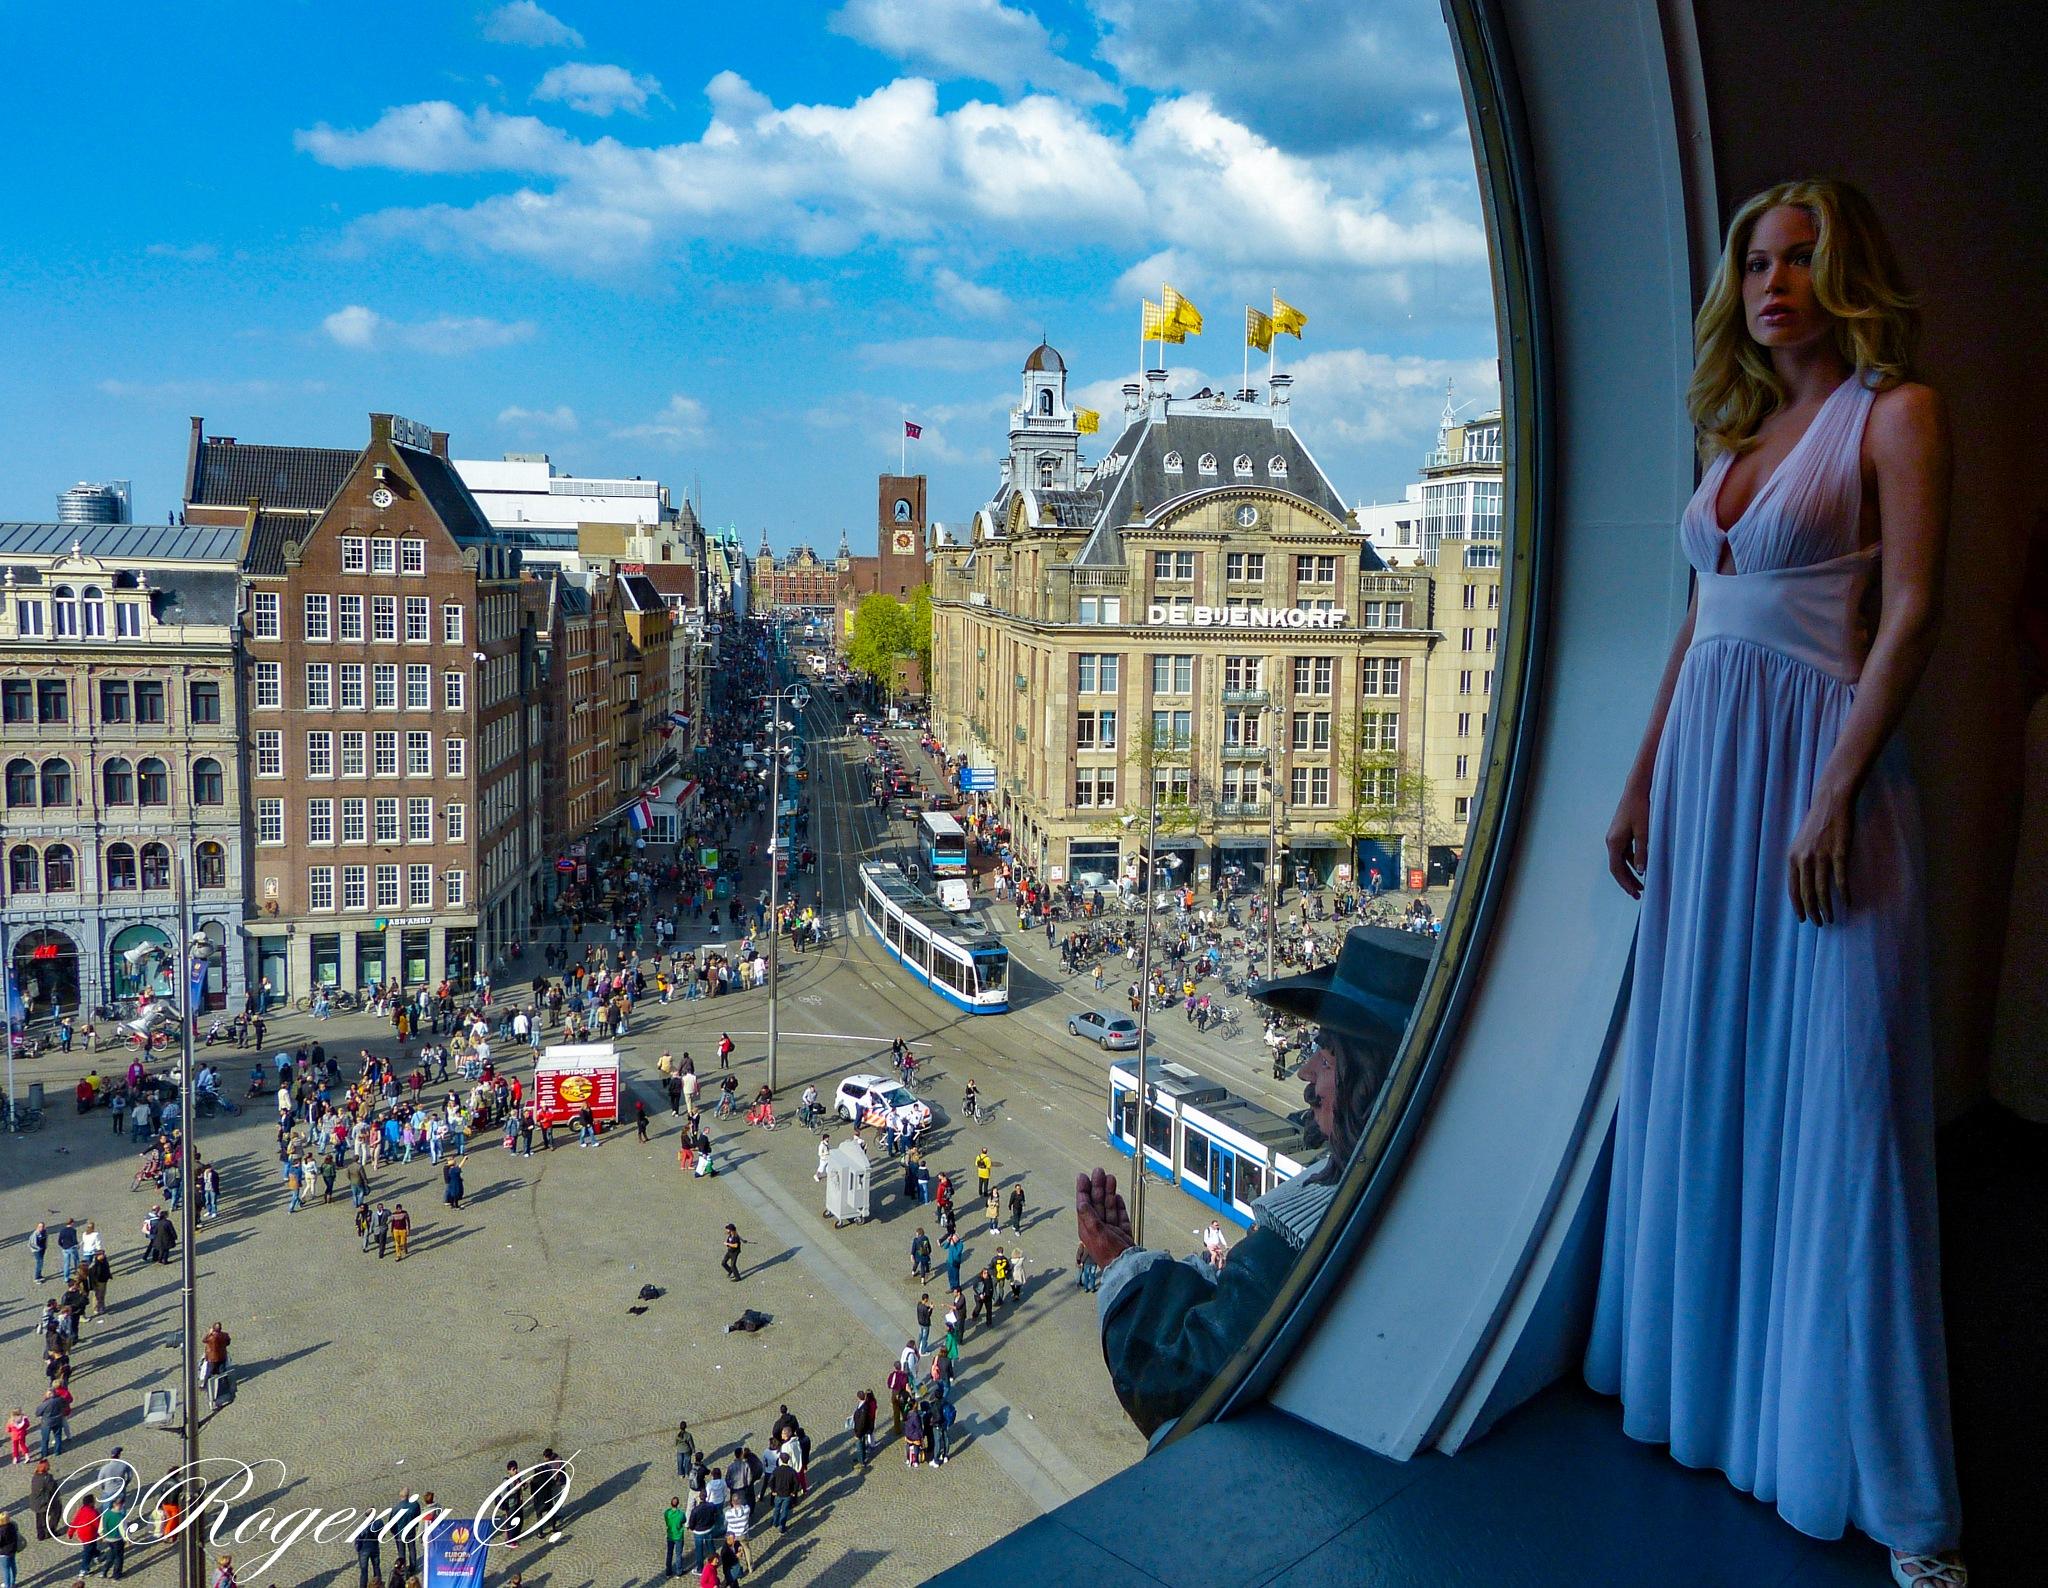 Madame Tussauds Amsterdam by Rogeria Øksendal